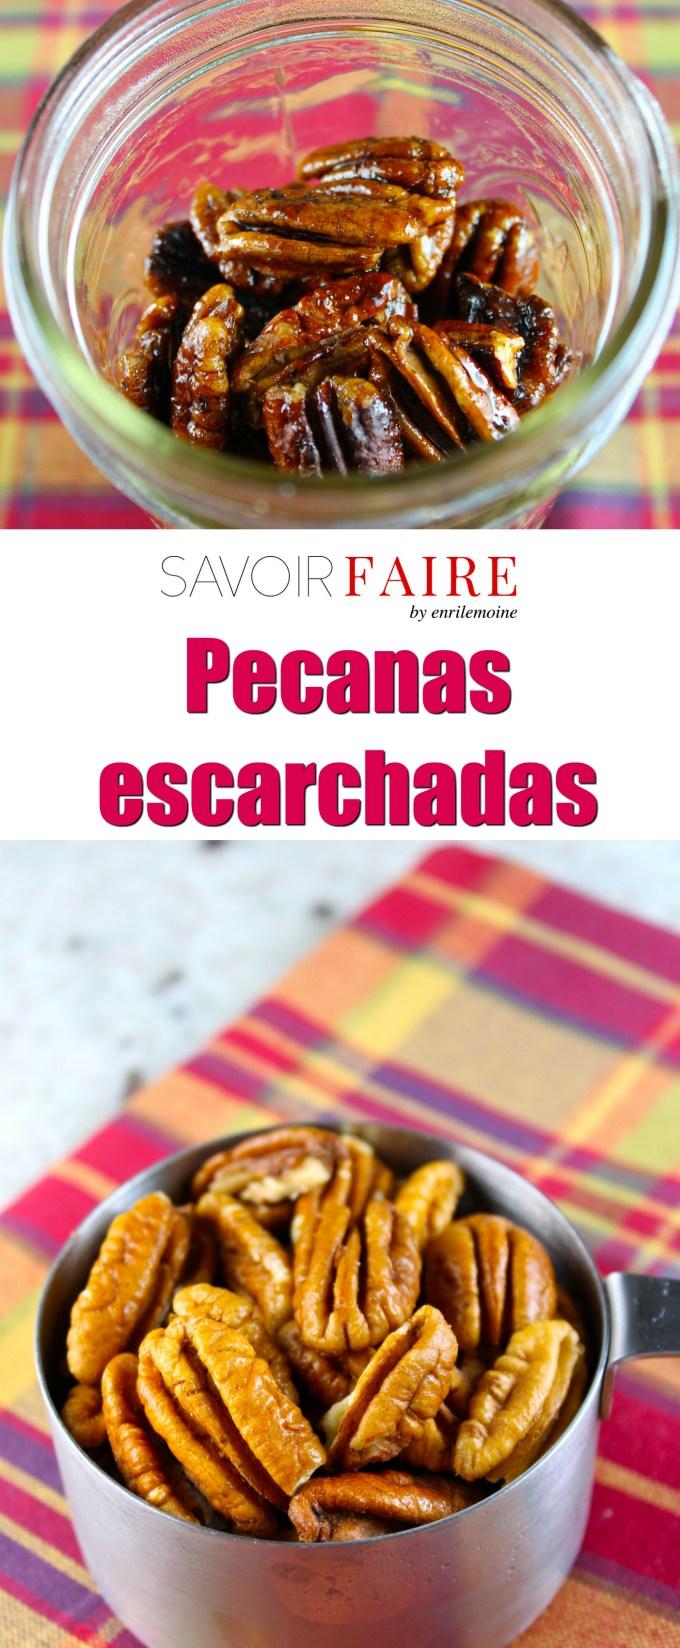 Pecanas escarchadas SAVOIR FAIRE by enrilemoine